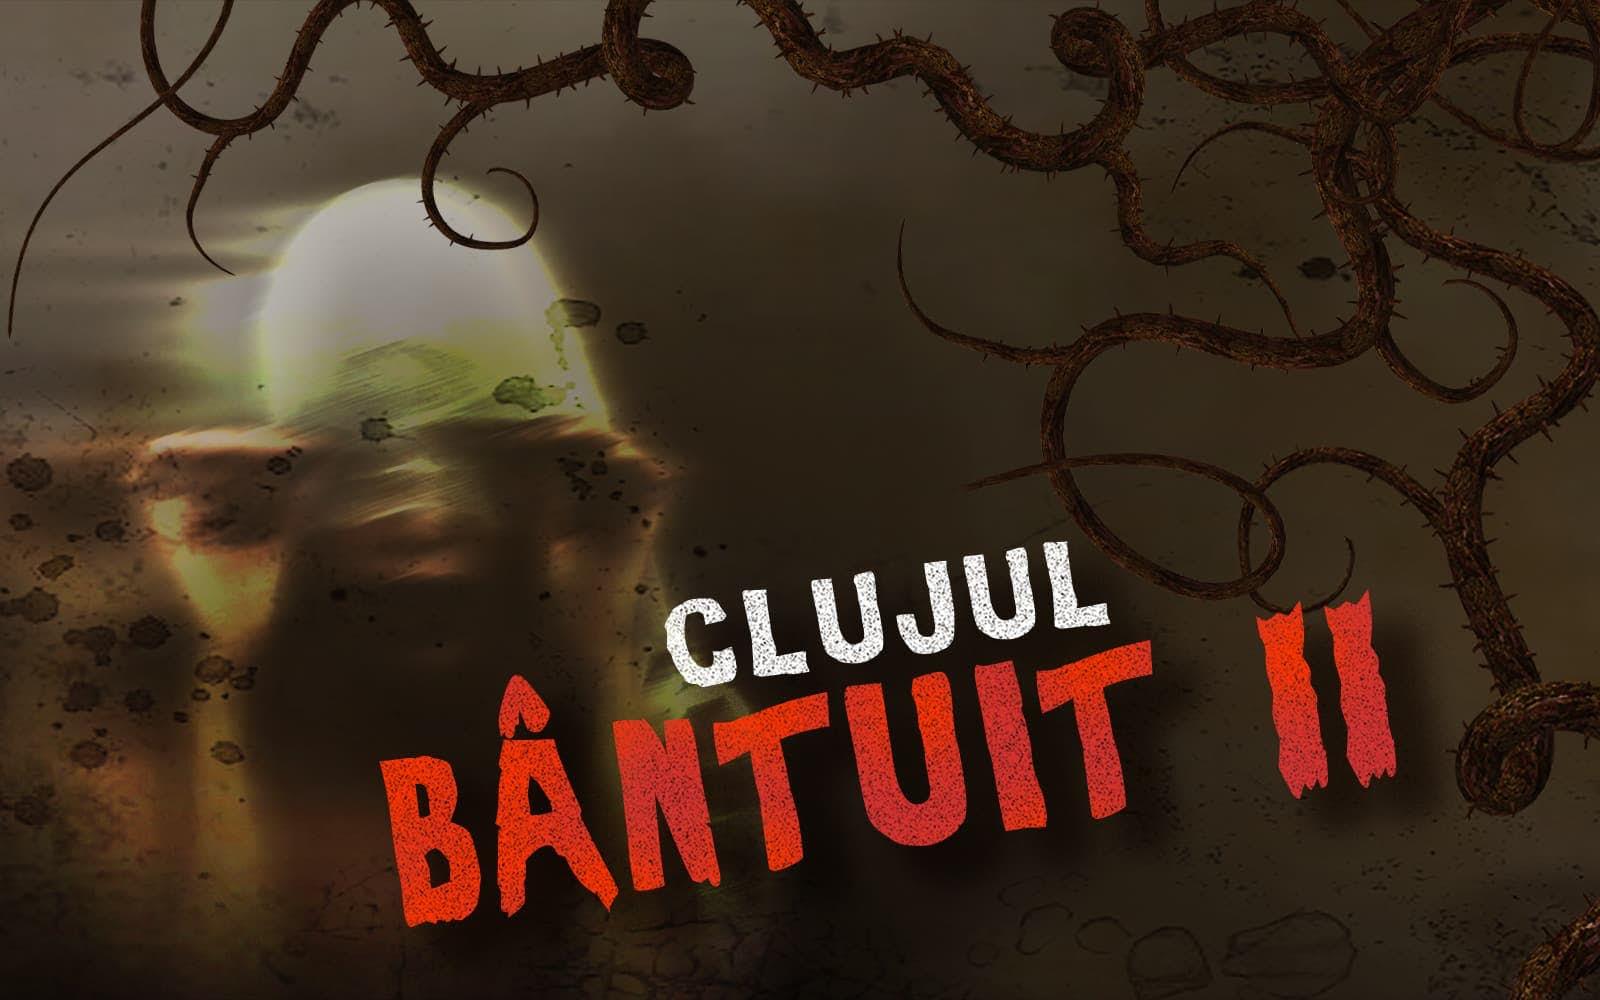 Clujul Bântuit II image